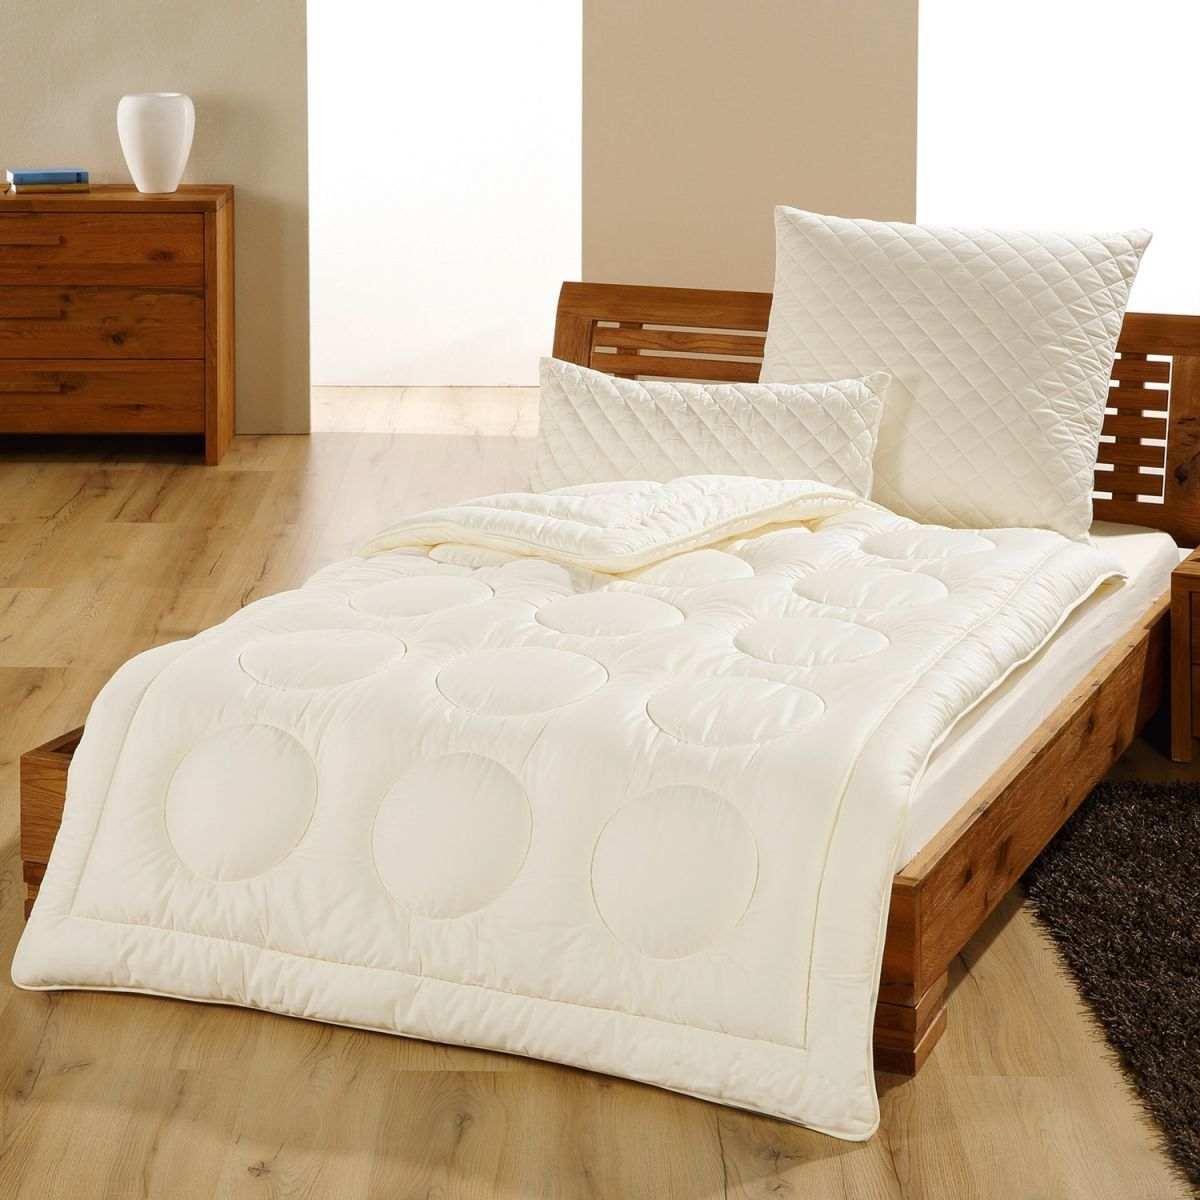 couette laine derby tradition des vosges. Black Bedroom Furniture Sets. Home Design Ideas